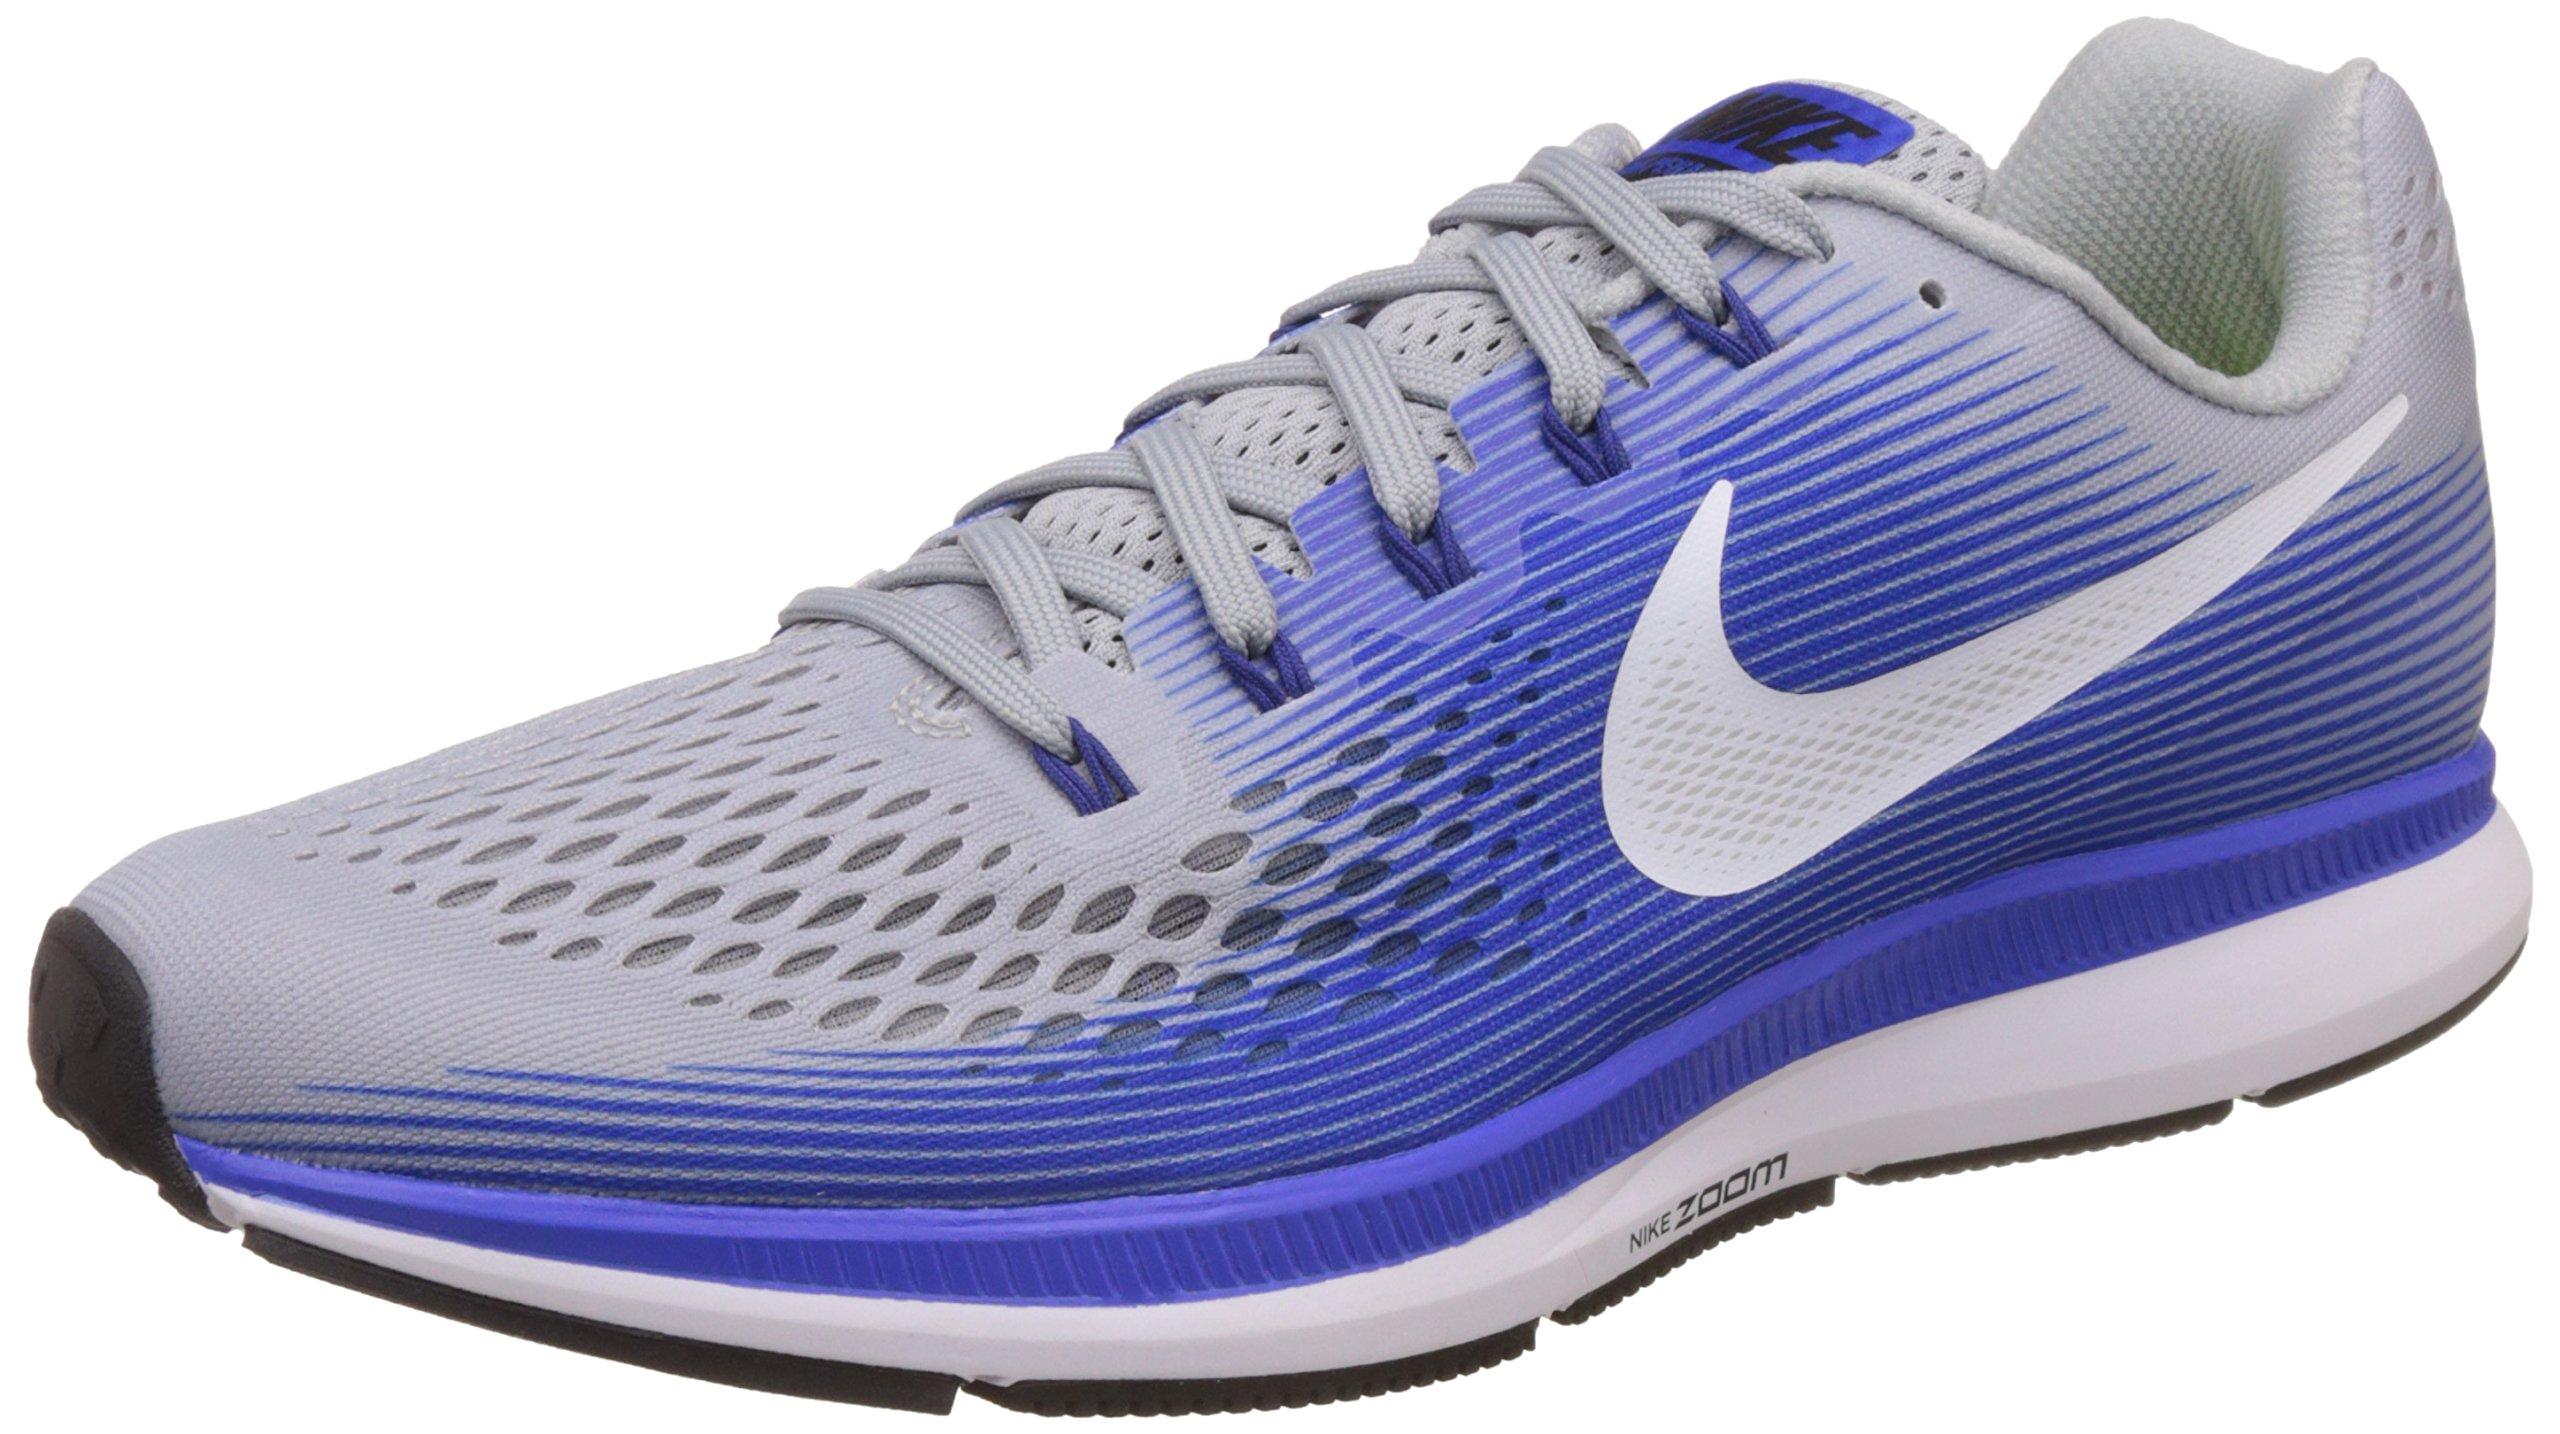 NIKE Mens Air Zoom Pegasus 34 Running Shoe (11 M US, Wolf Grey/White/Racer Blue) by Nike (Image #1)